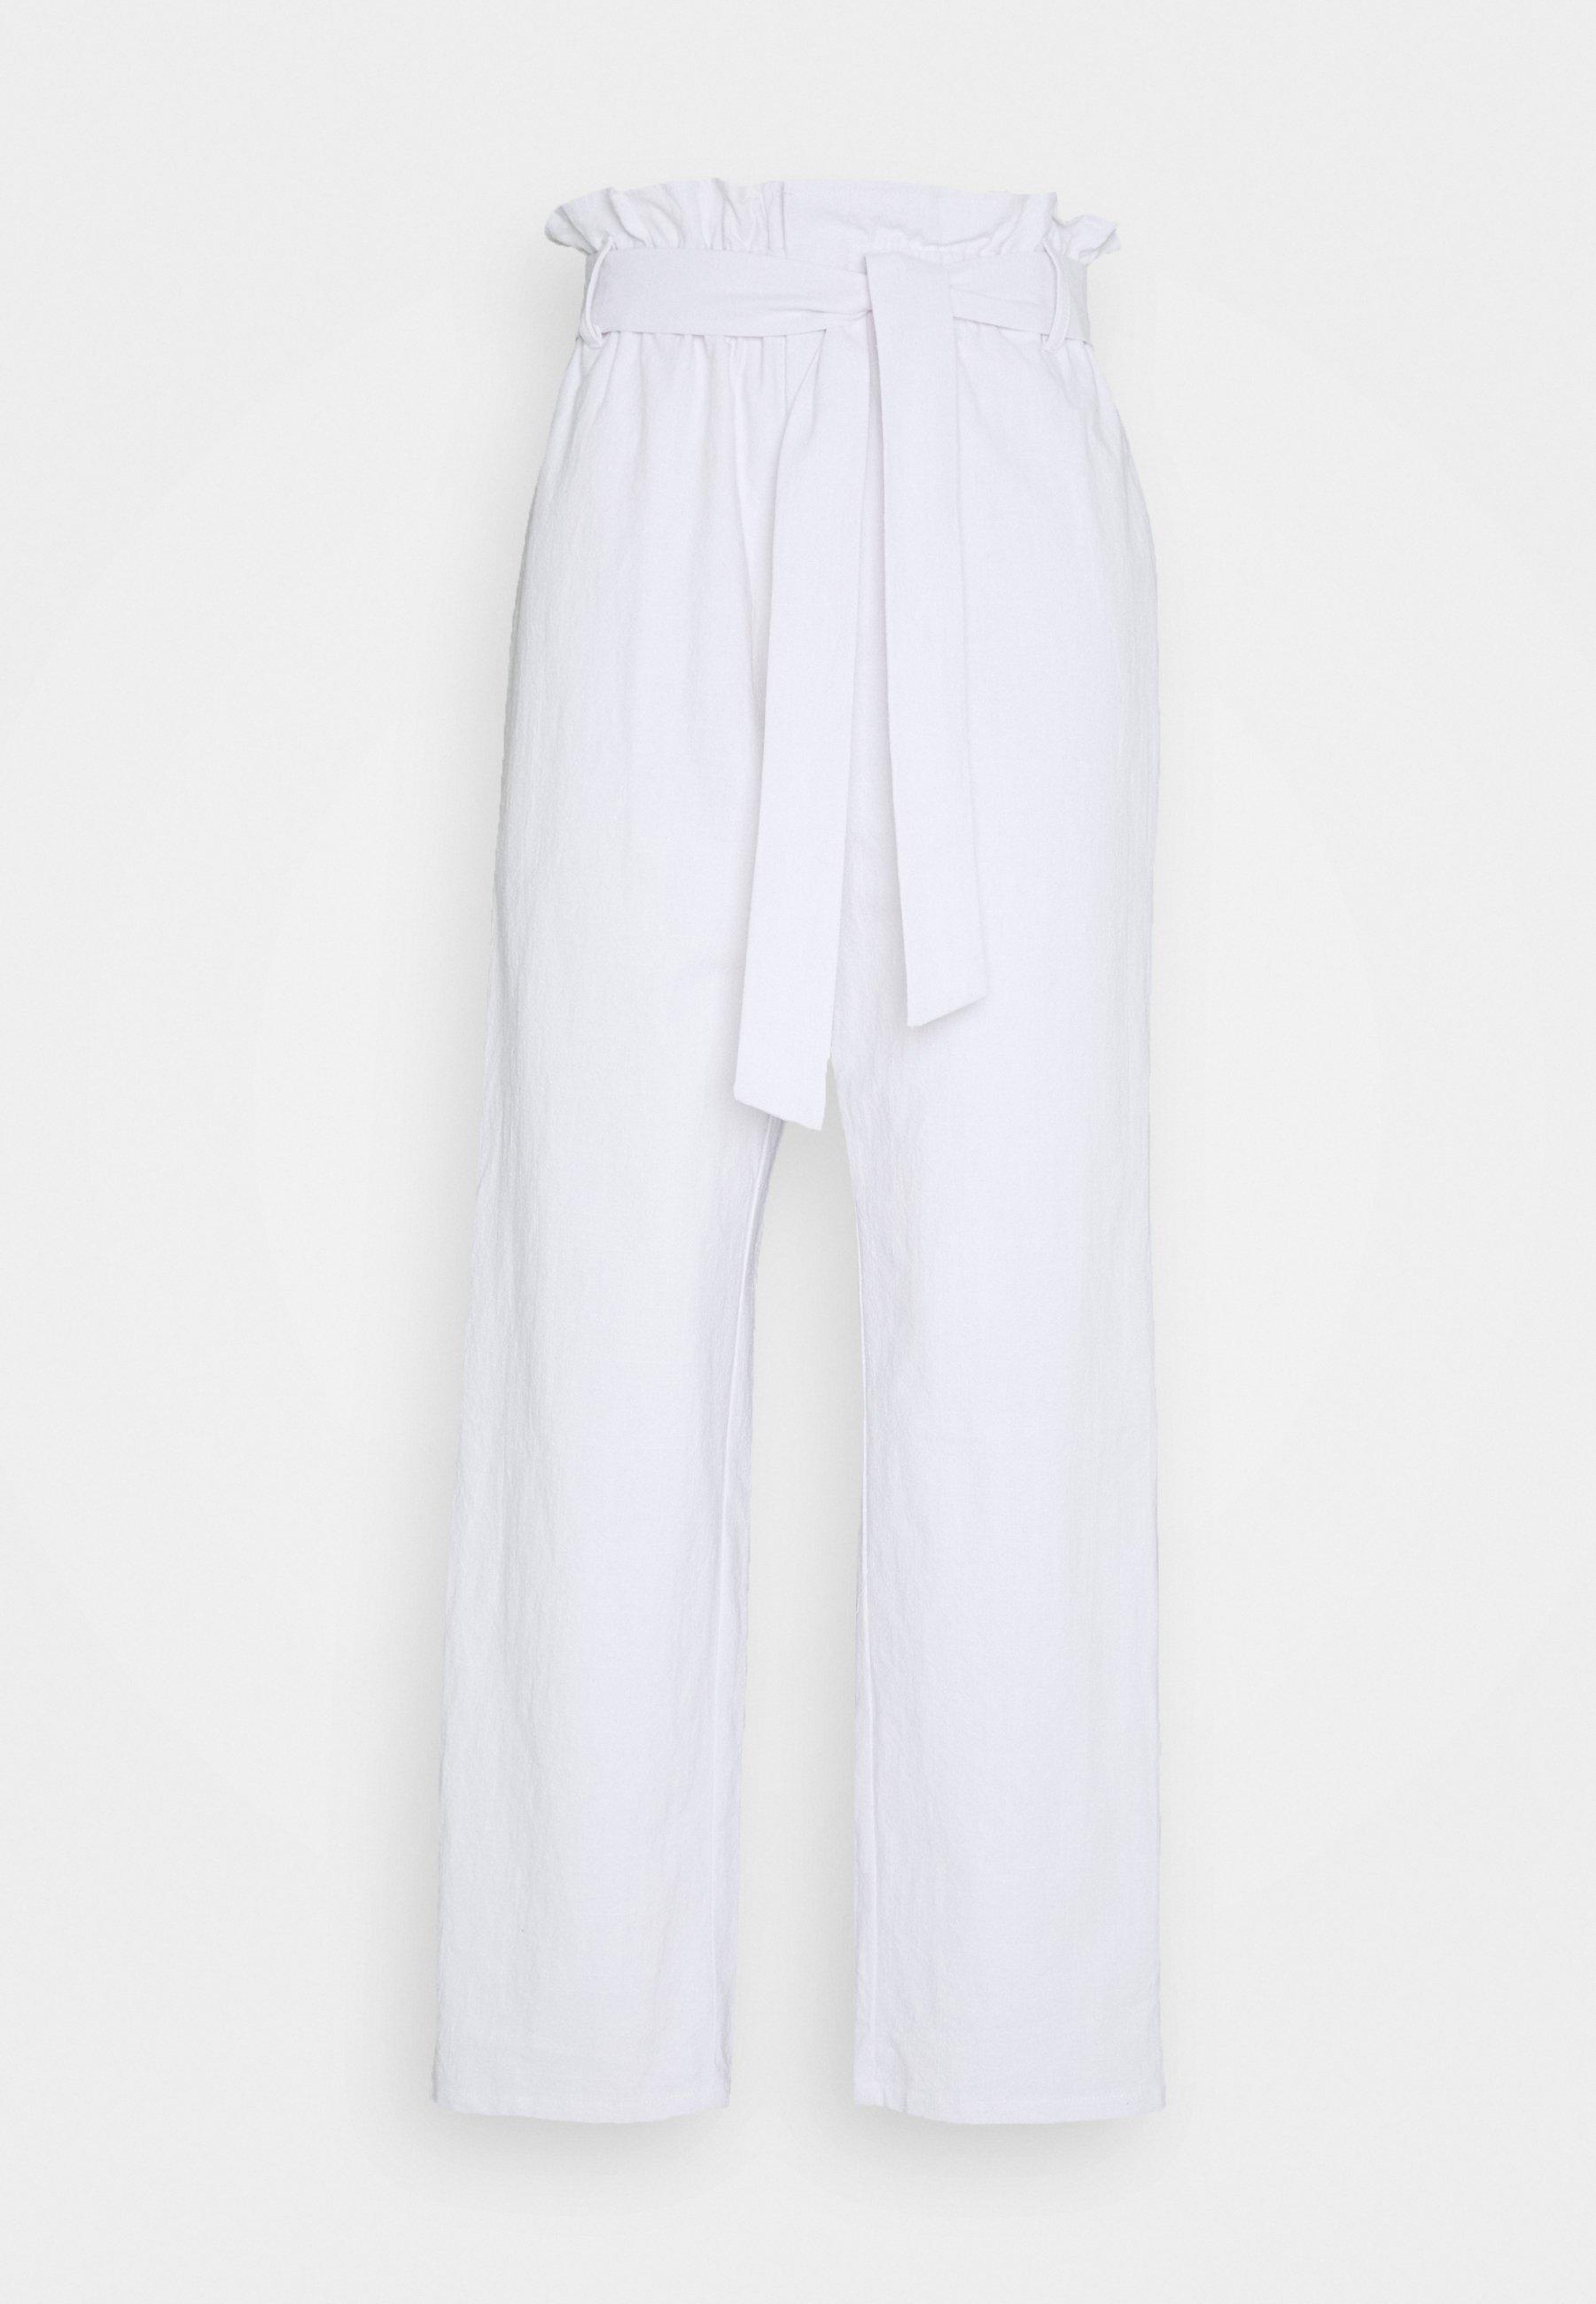 PAPER BAG PANT Bukse white